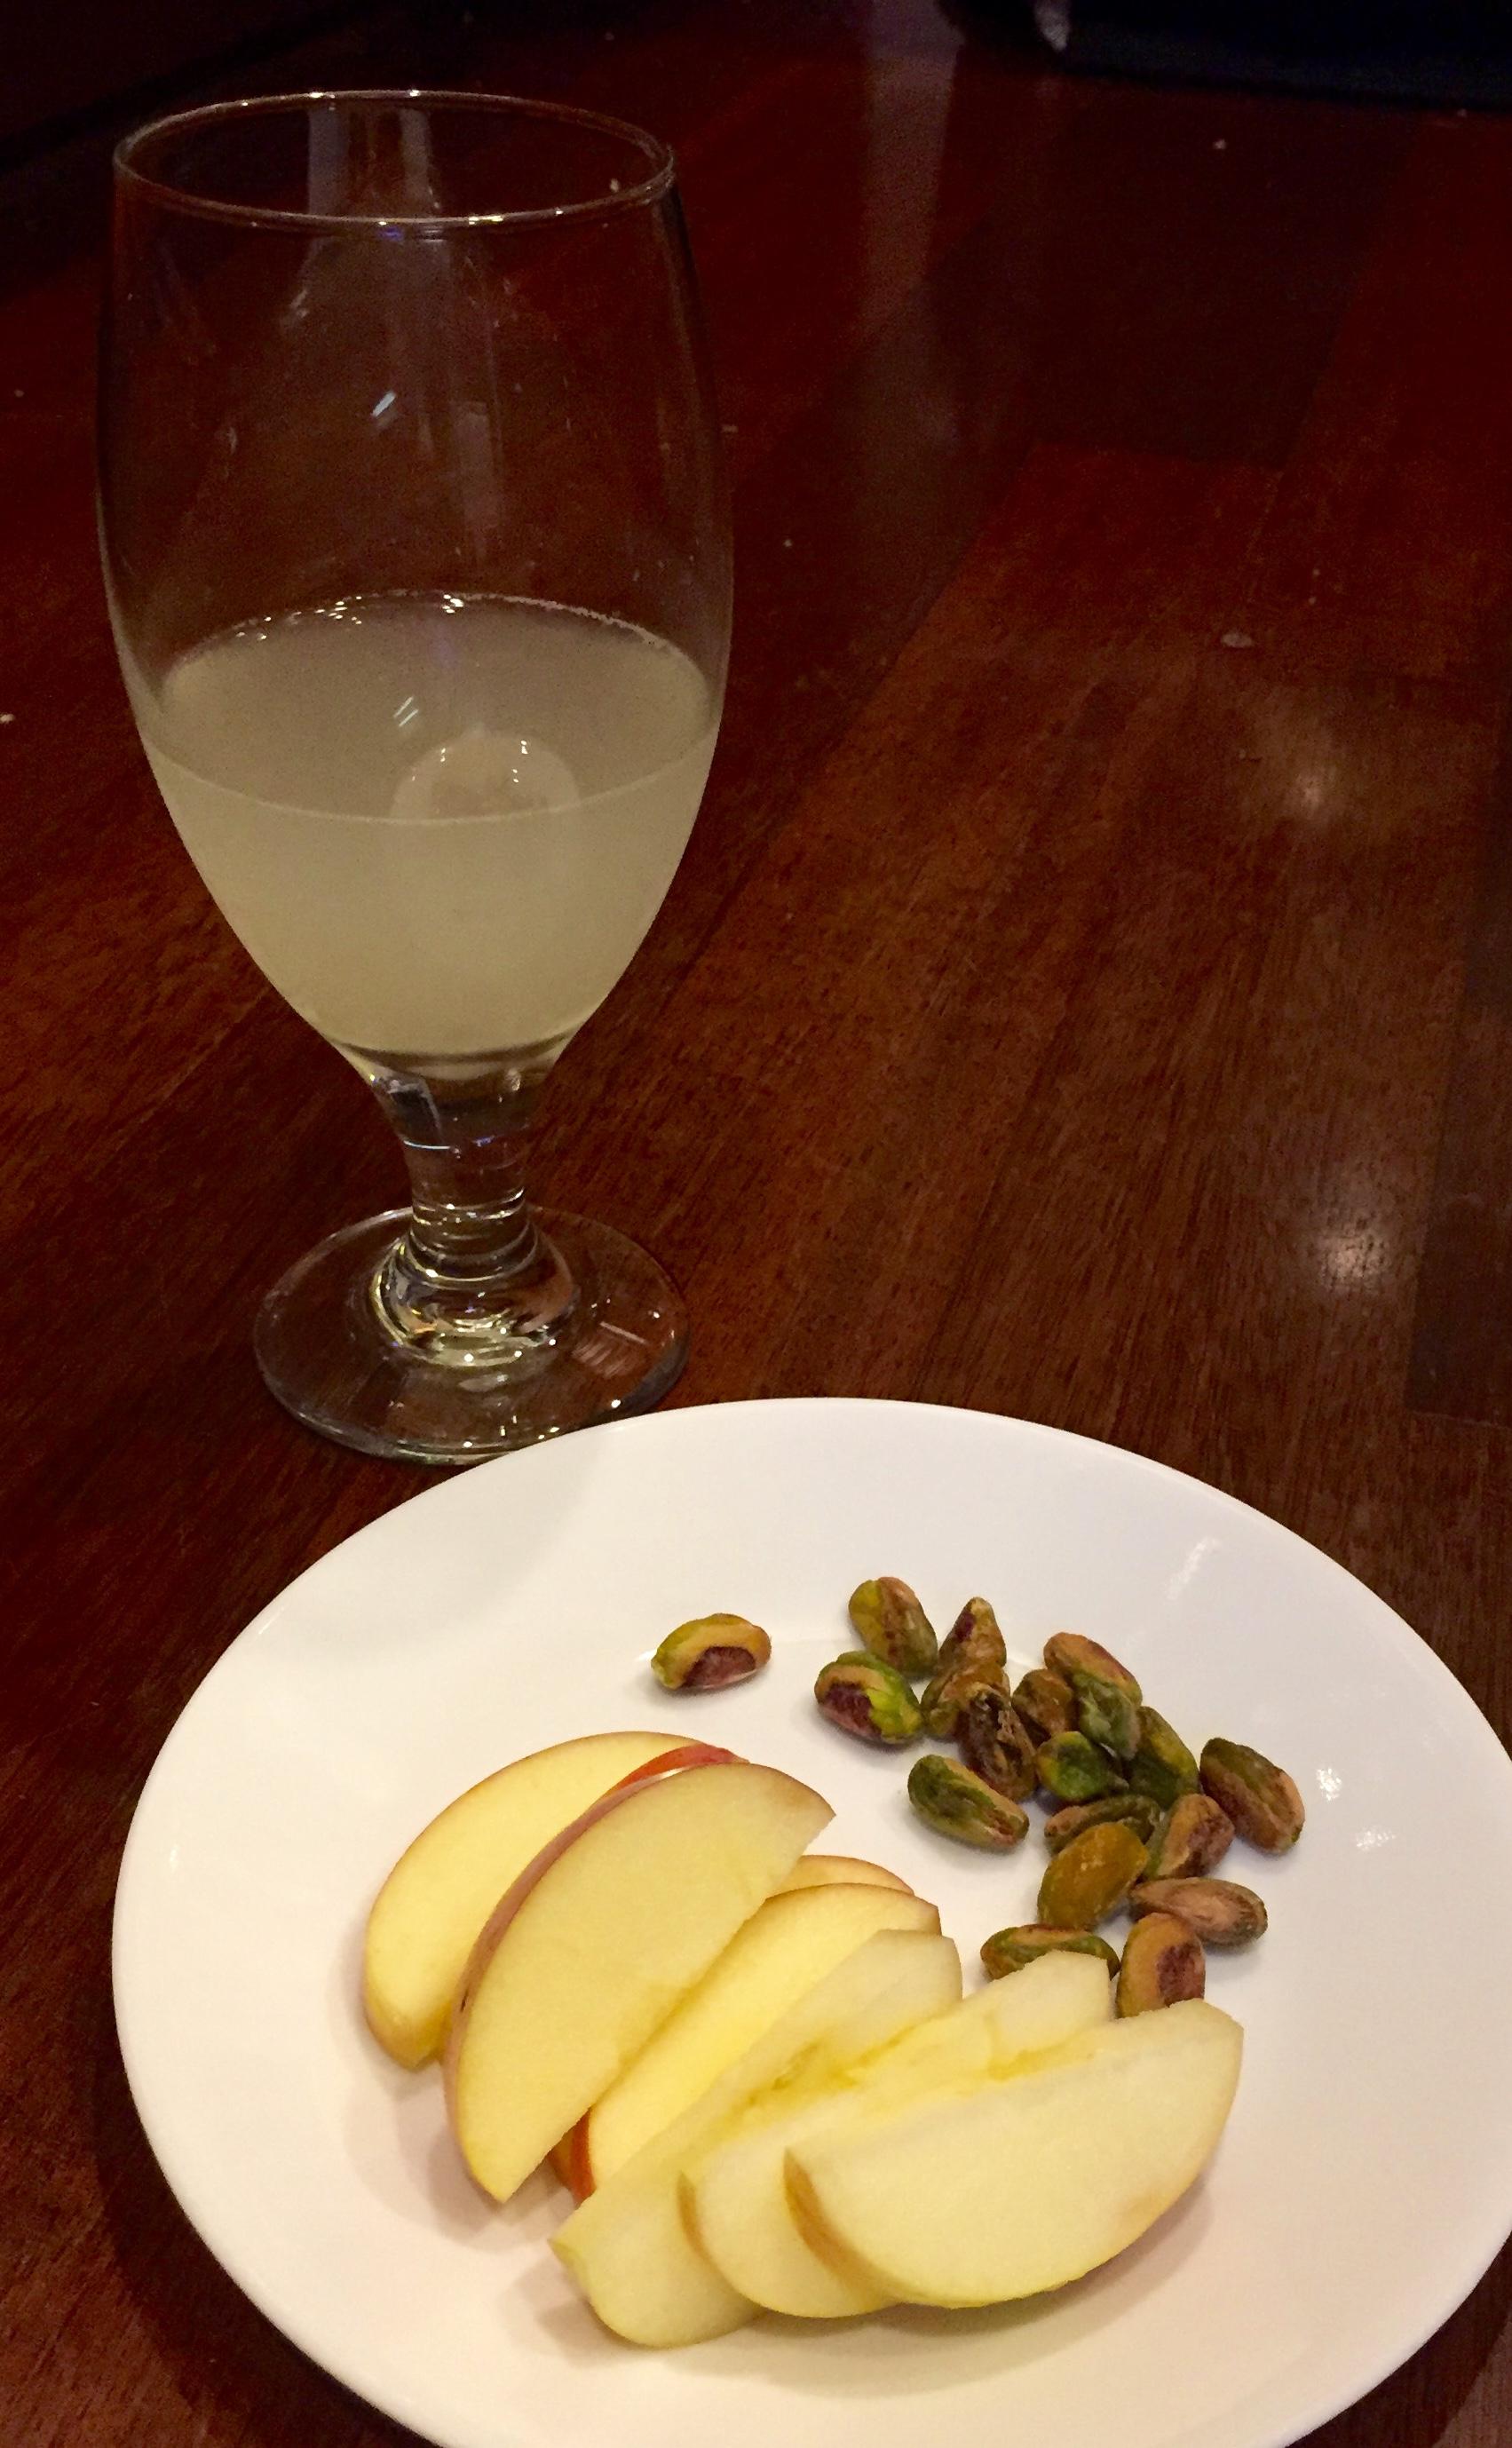 water kefir fermented with lemon/lime juices pistachios apple slices